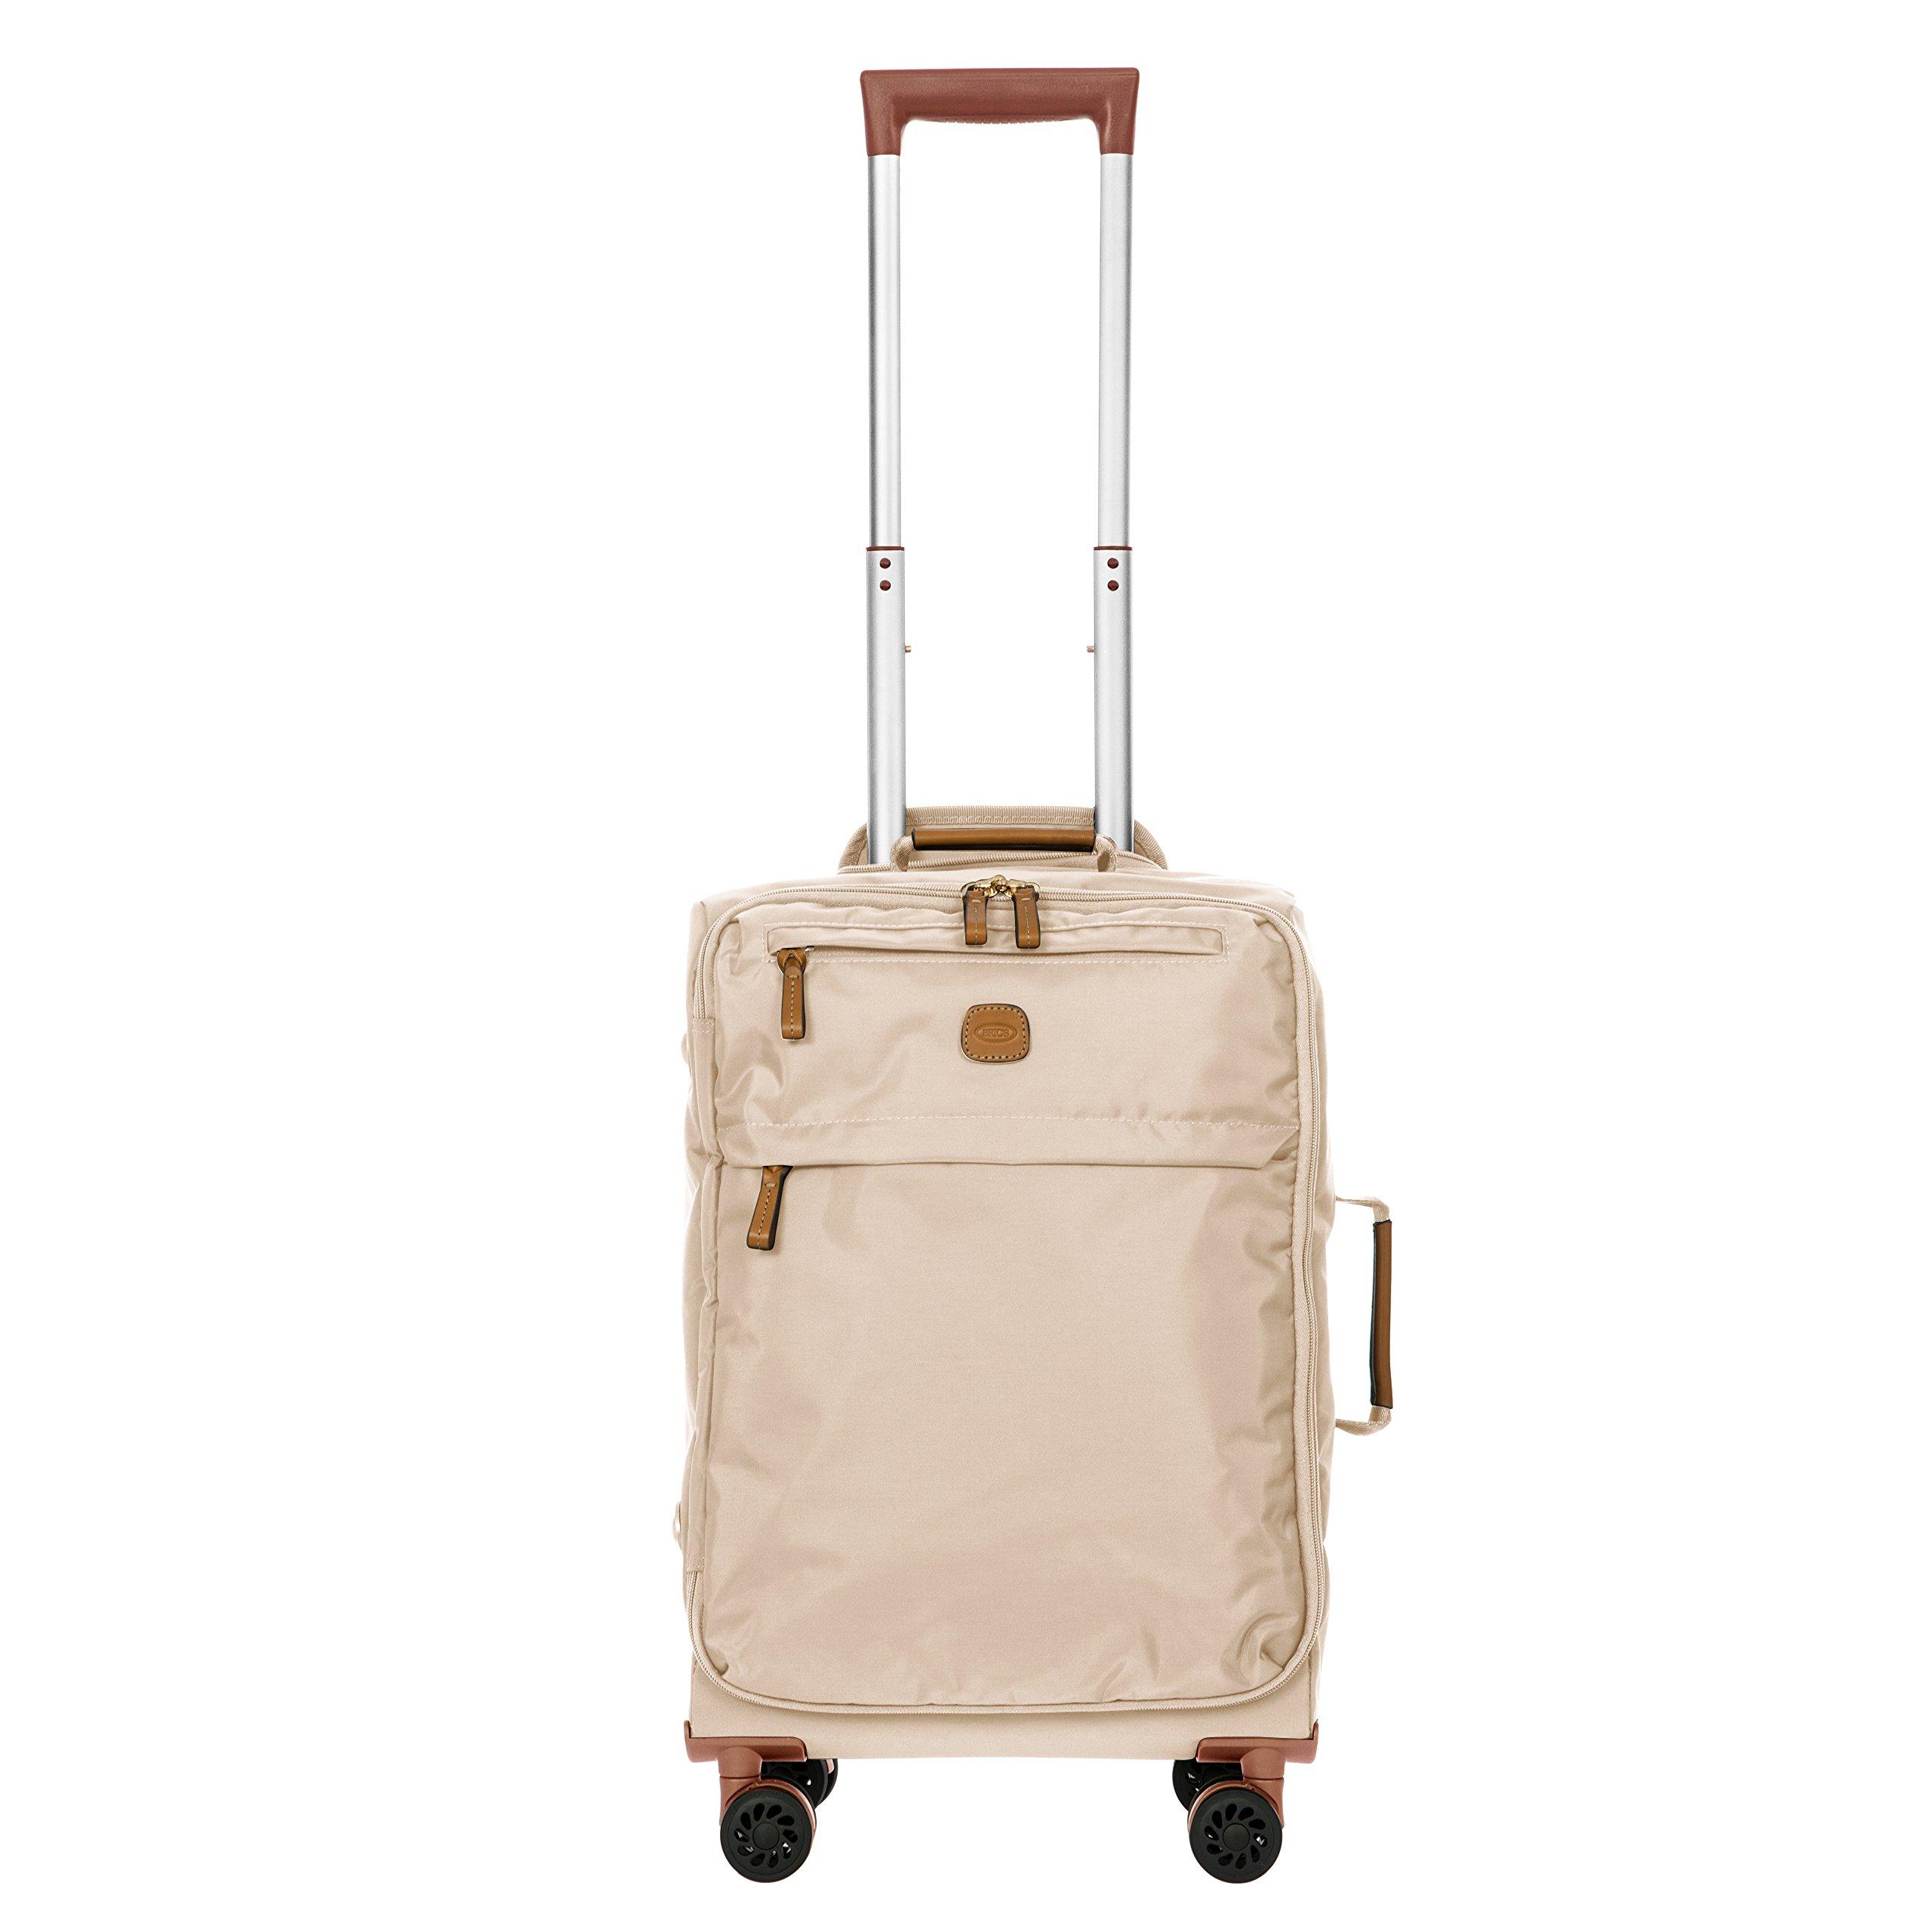 Papyrus Brics X-Bag//x-Travel 30 Inch Large Spinner W//Frame